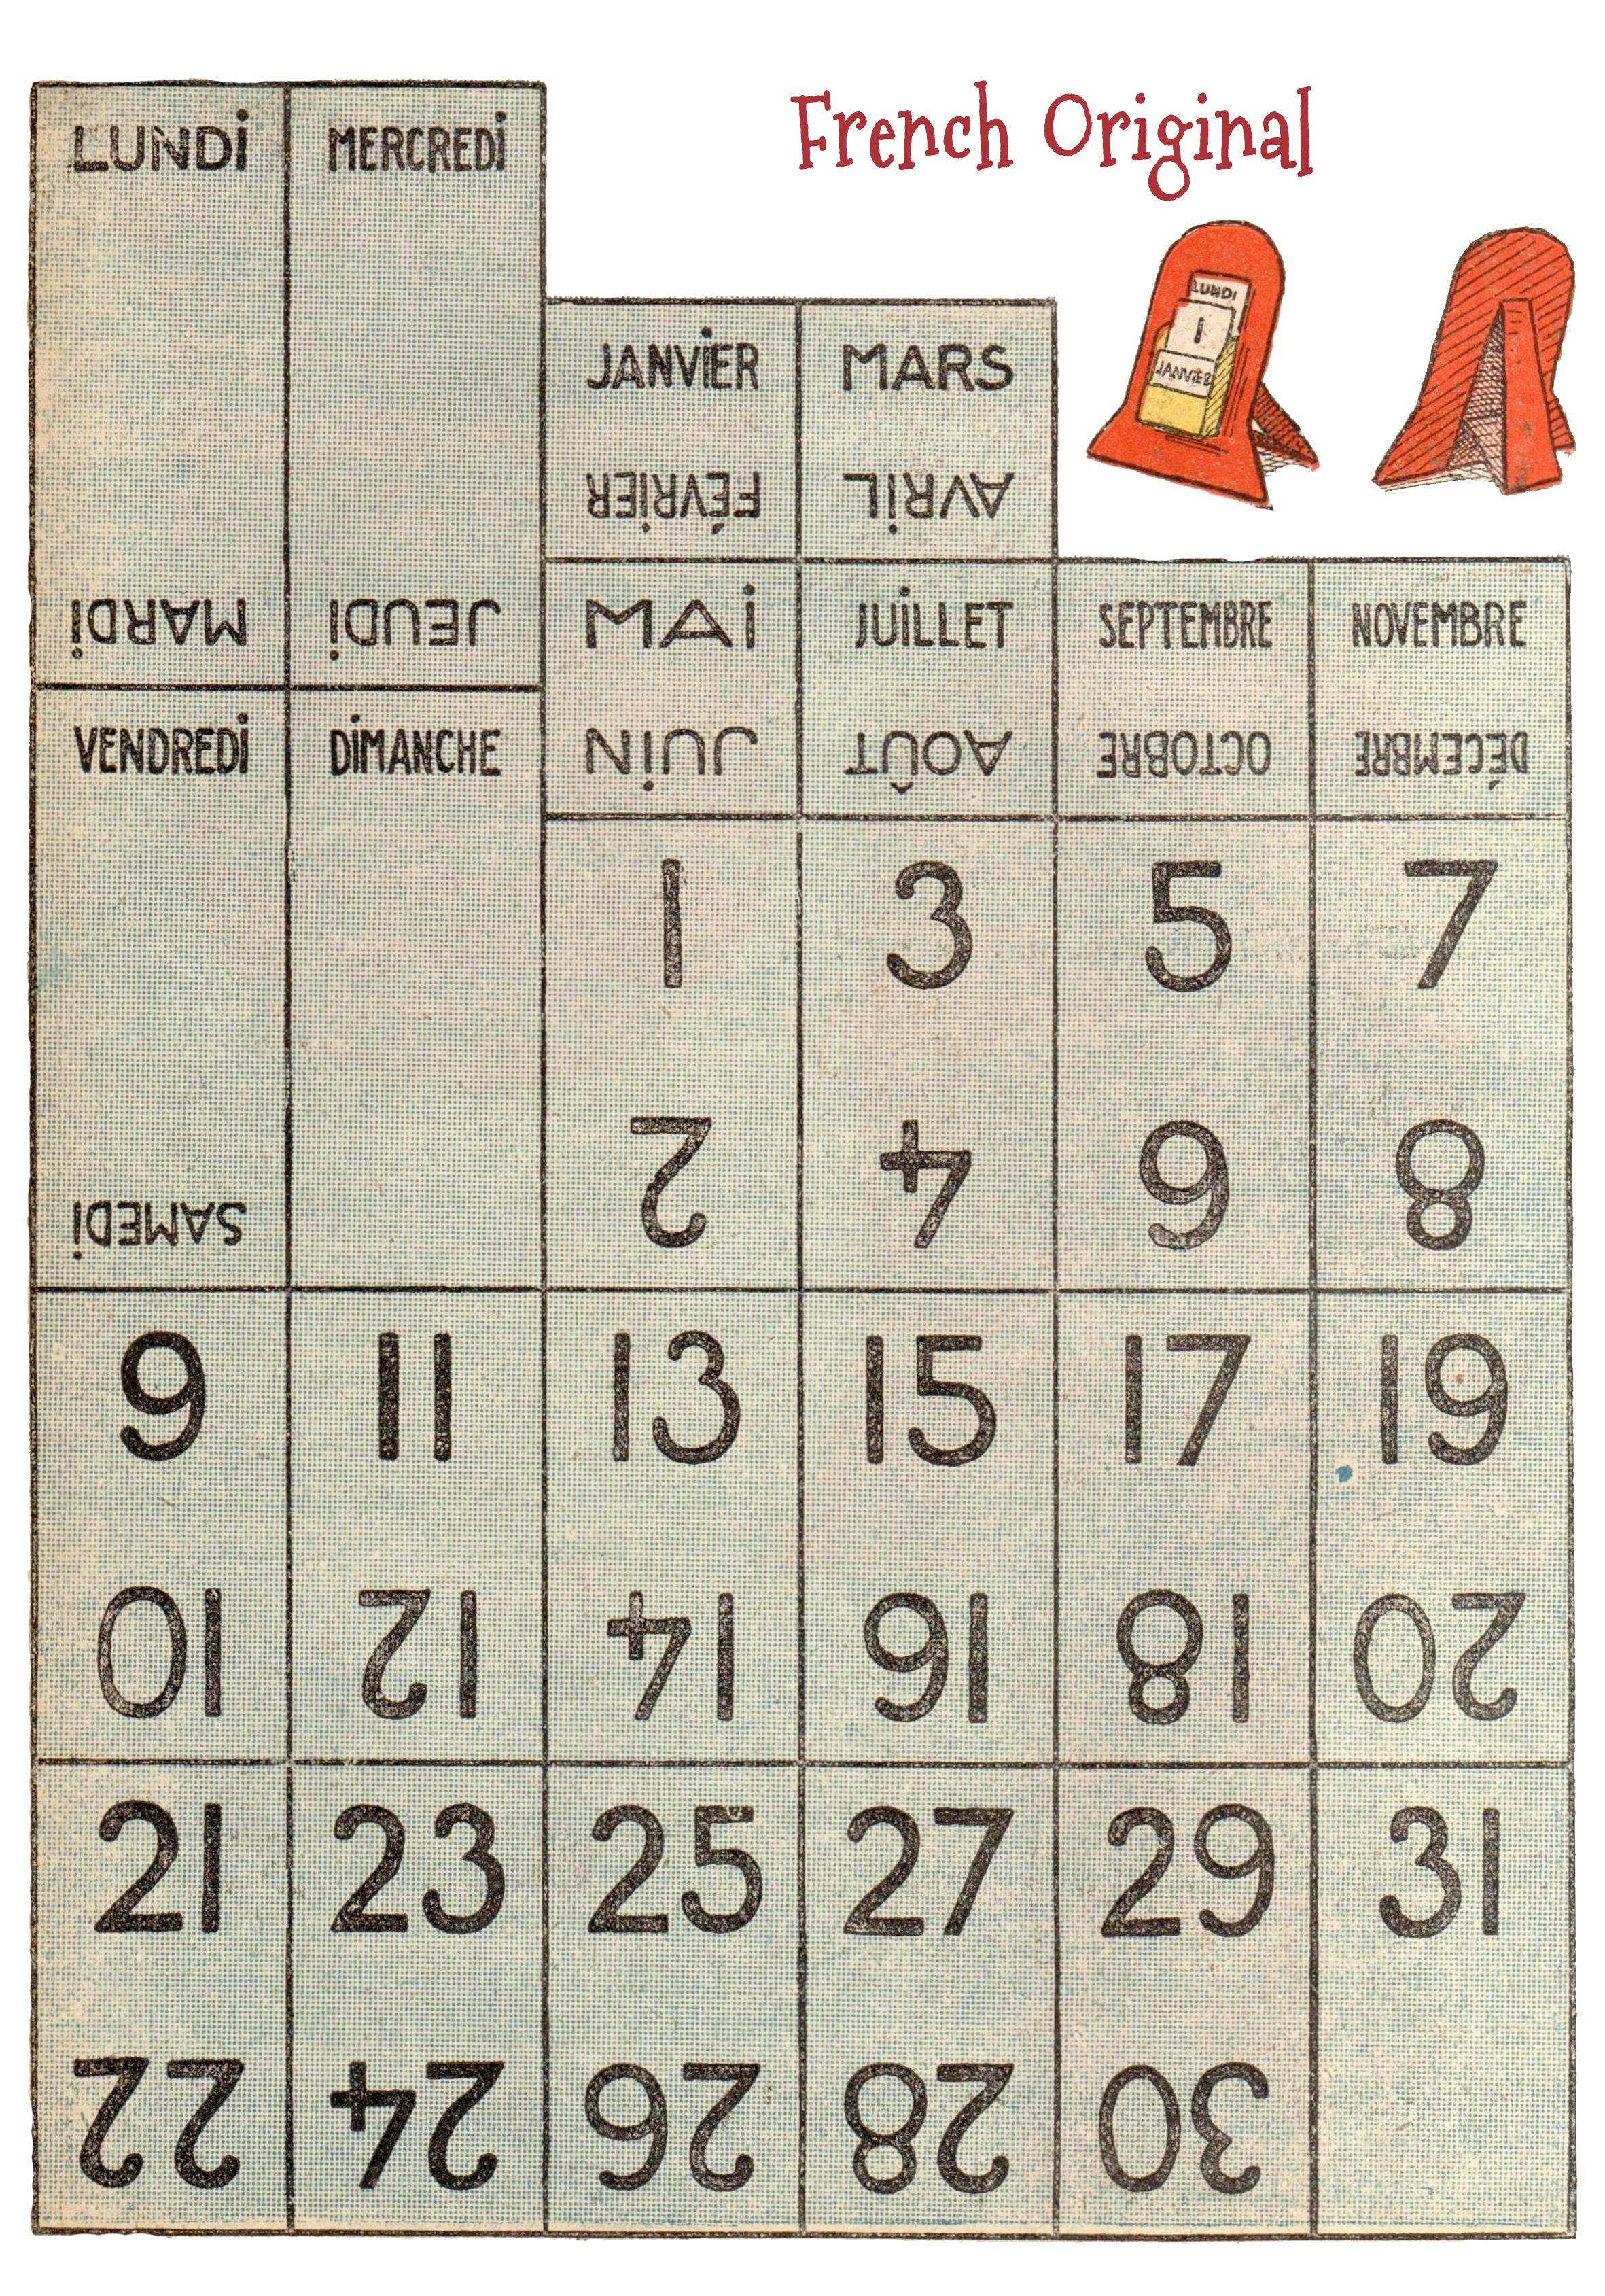 Vintage Perpetual Calendar Free Printable Wings Of Whimsy  Xjb